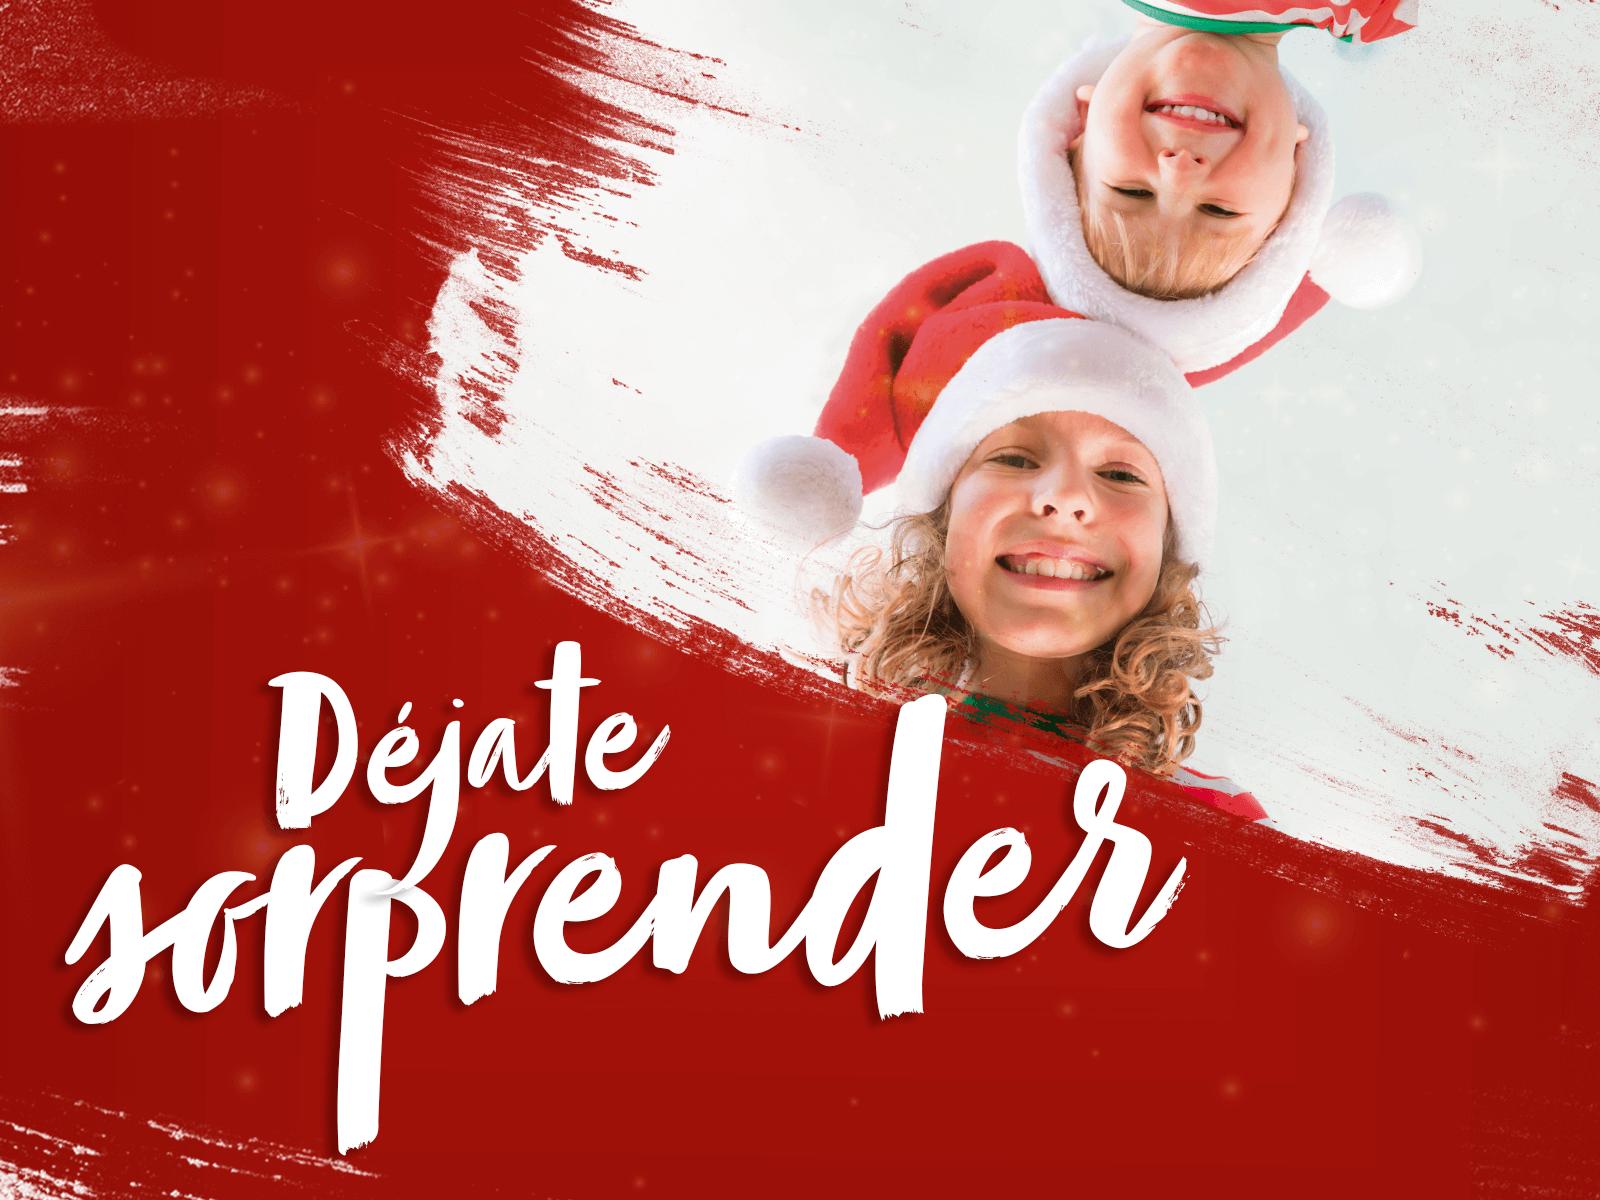 ¡La Navidad llega a Islazul del 2 de diciembre al 5 de enero!